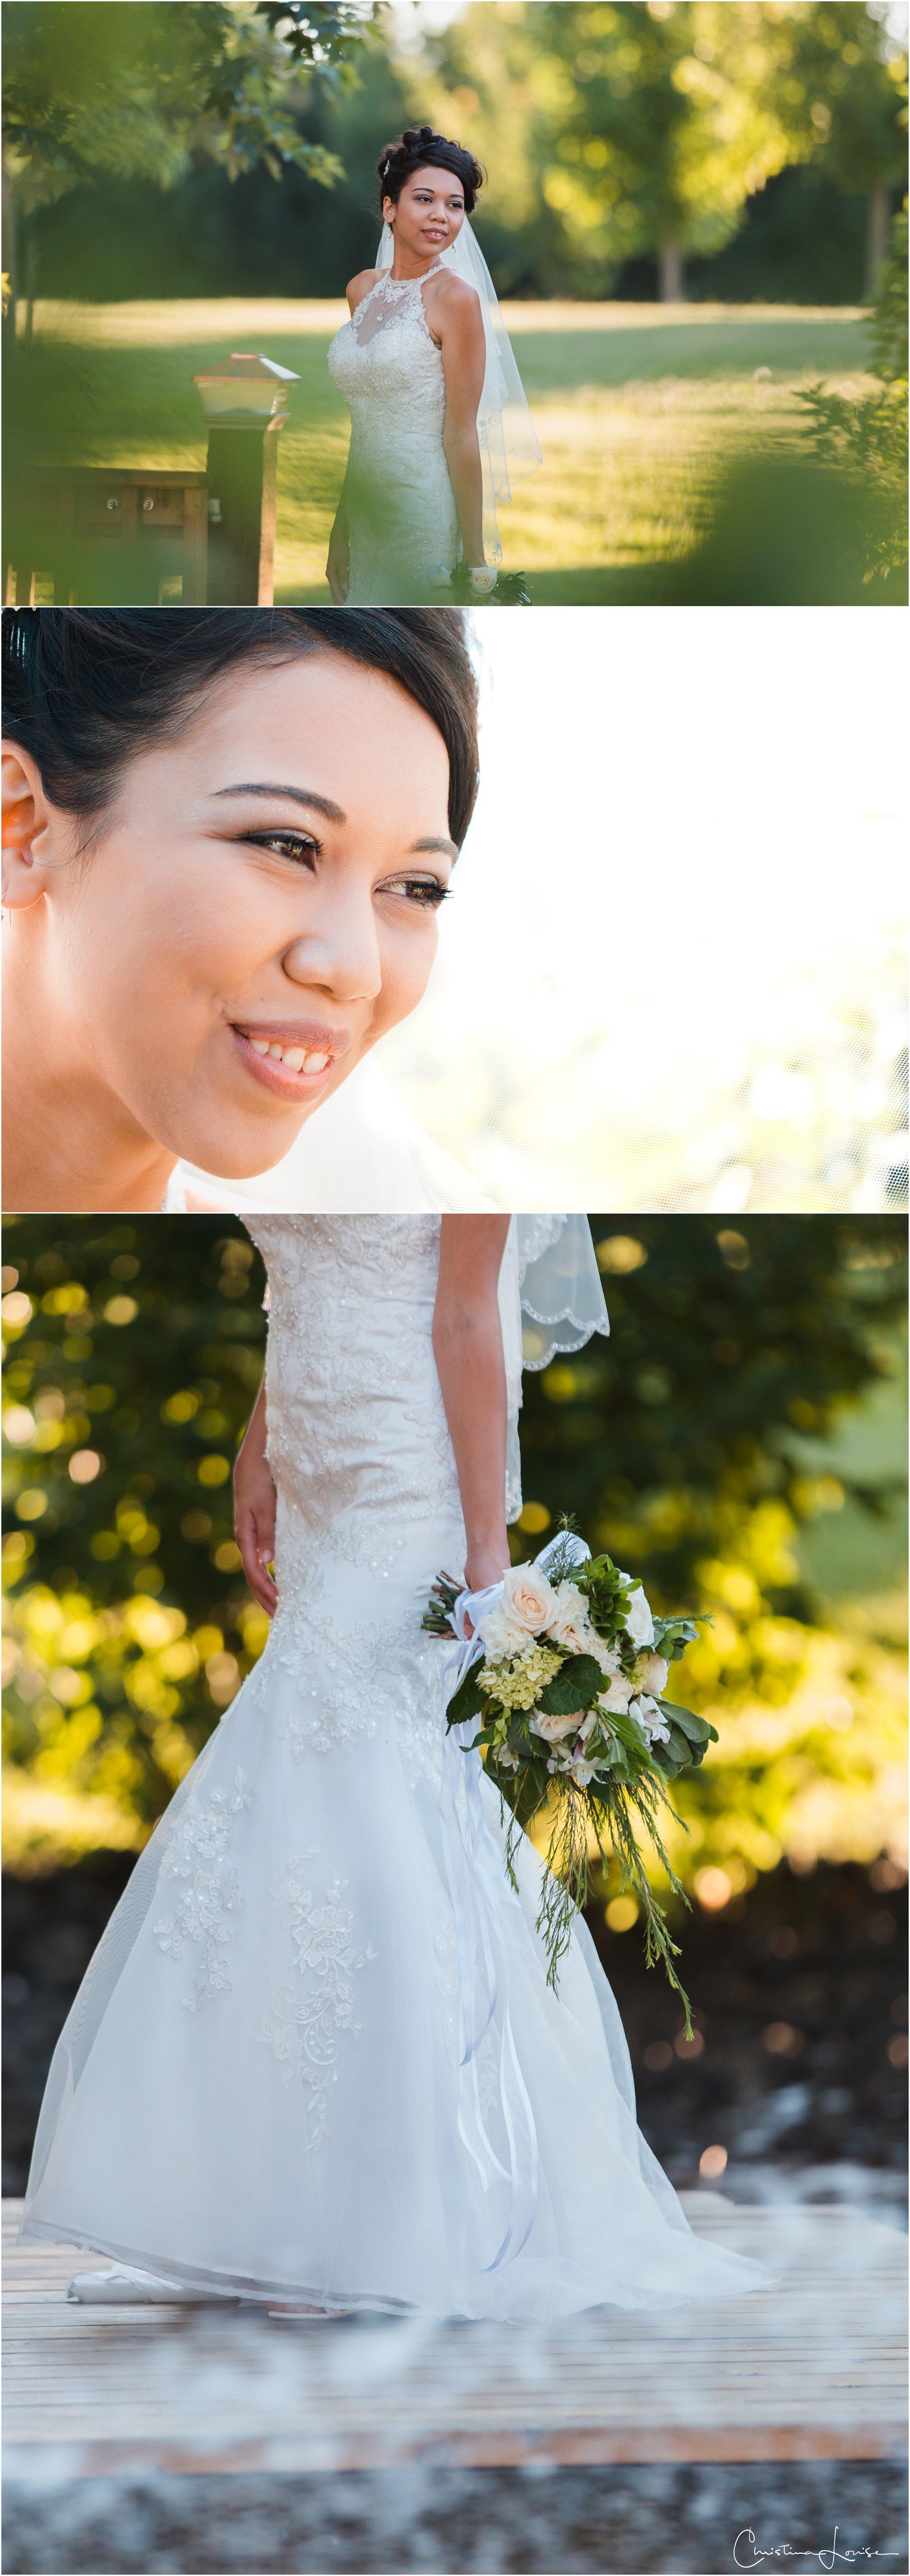 Roseburg_winston_oregon_wedding_bride_portrait.jpg